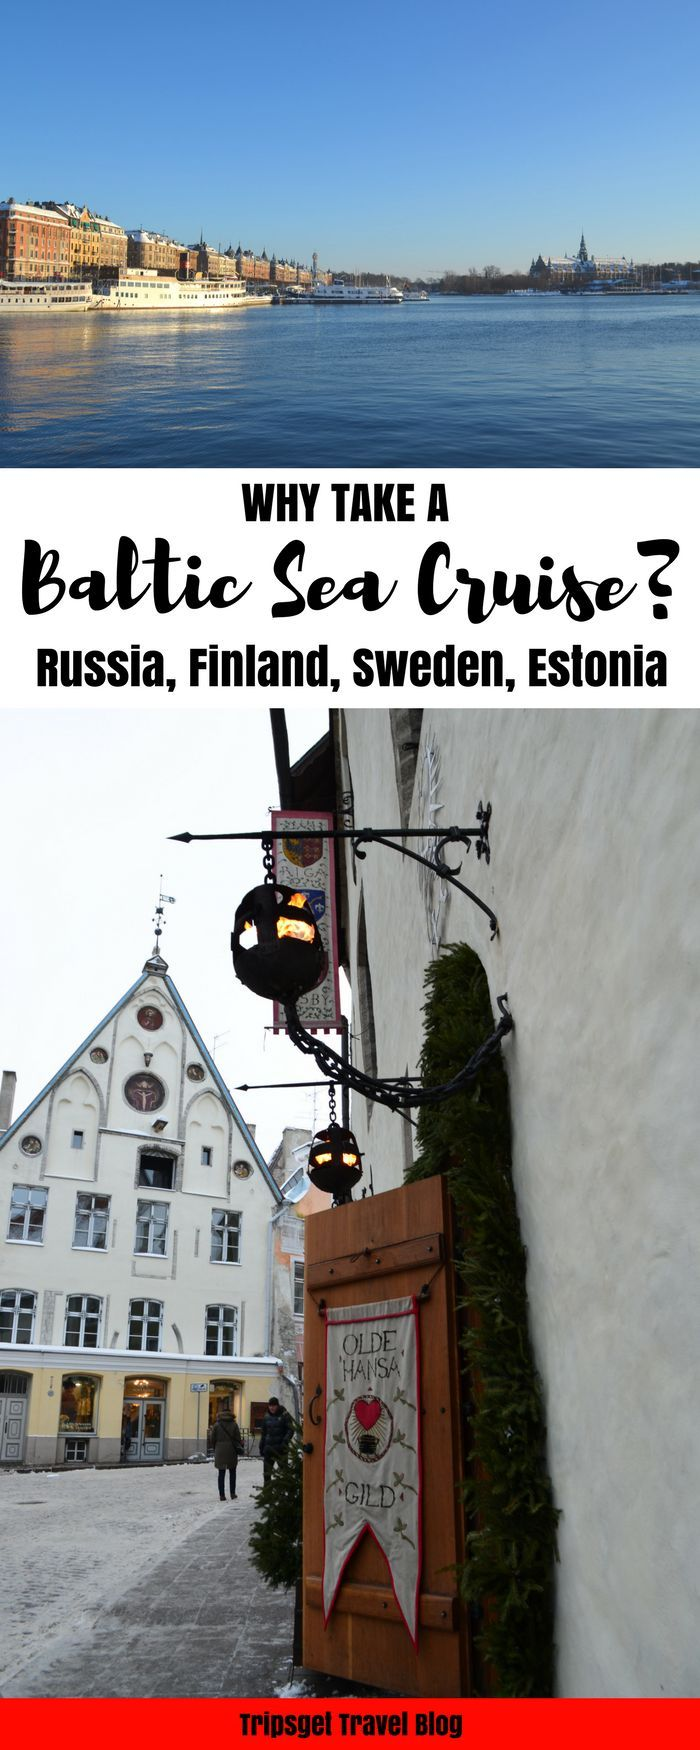 Baltic Sea Cruise, Scandinavian Cruise, Sweden, Russia, Finland, Estonia. St. Petersburg, Helsinki, Tallinn, Stockholm